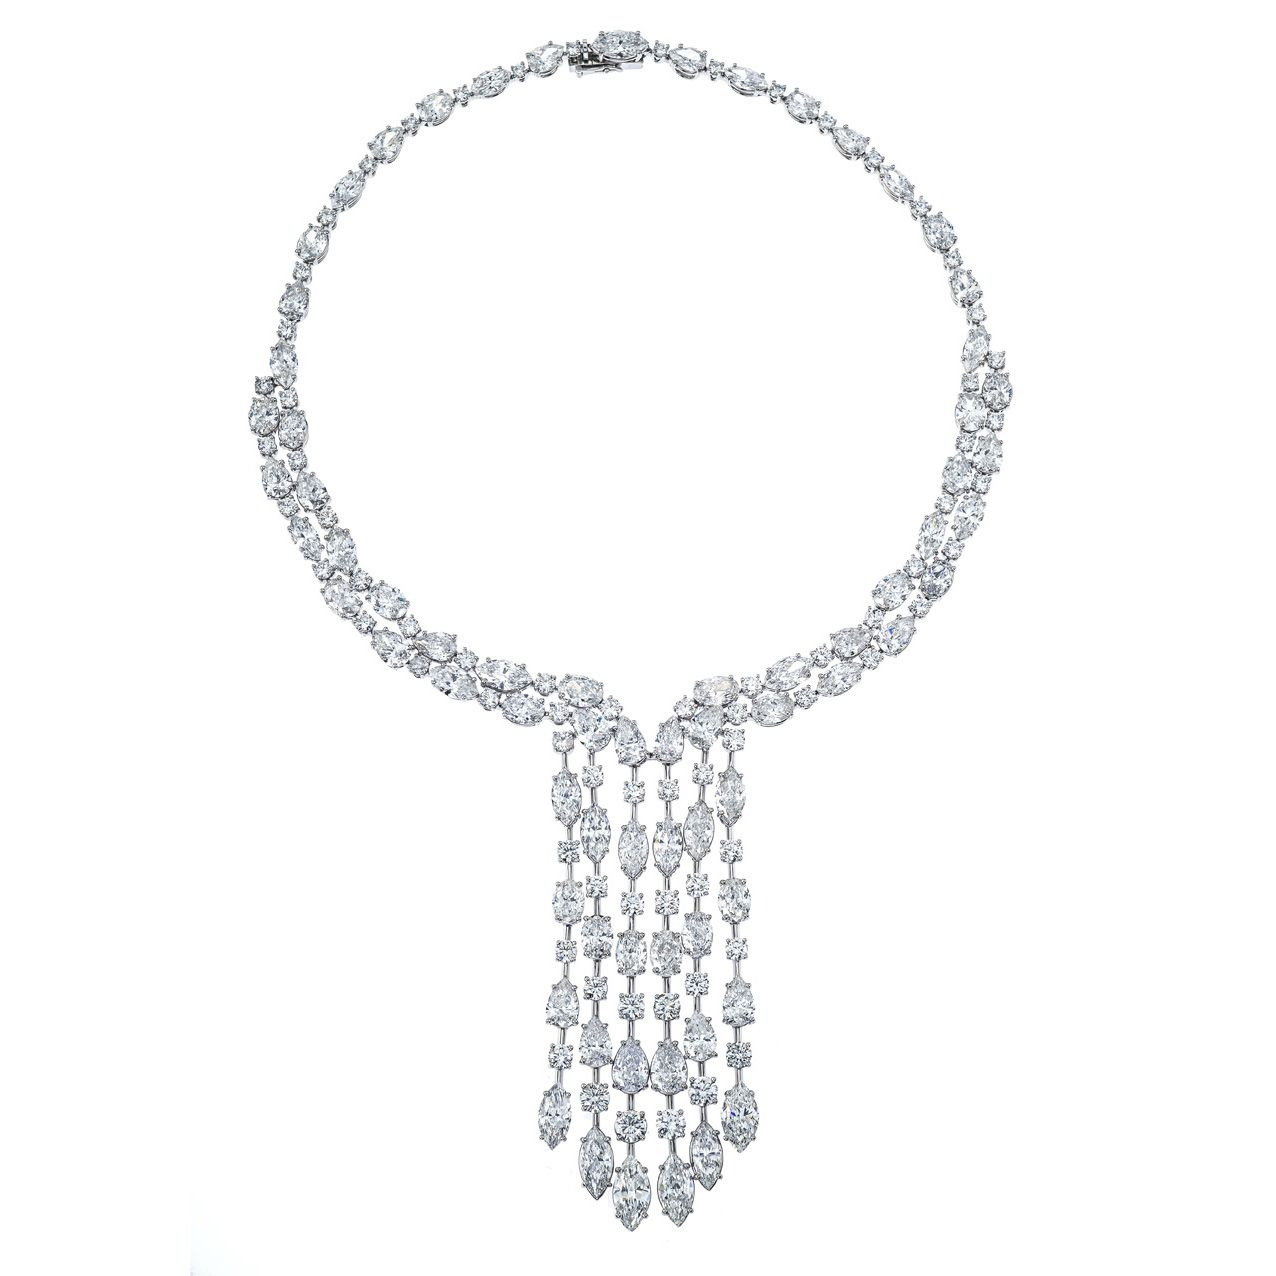 e6f0db5eaf2 William Goldberg - The World's Most Breathtaking Diamonds   jewelry ...